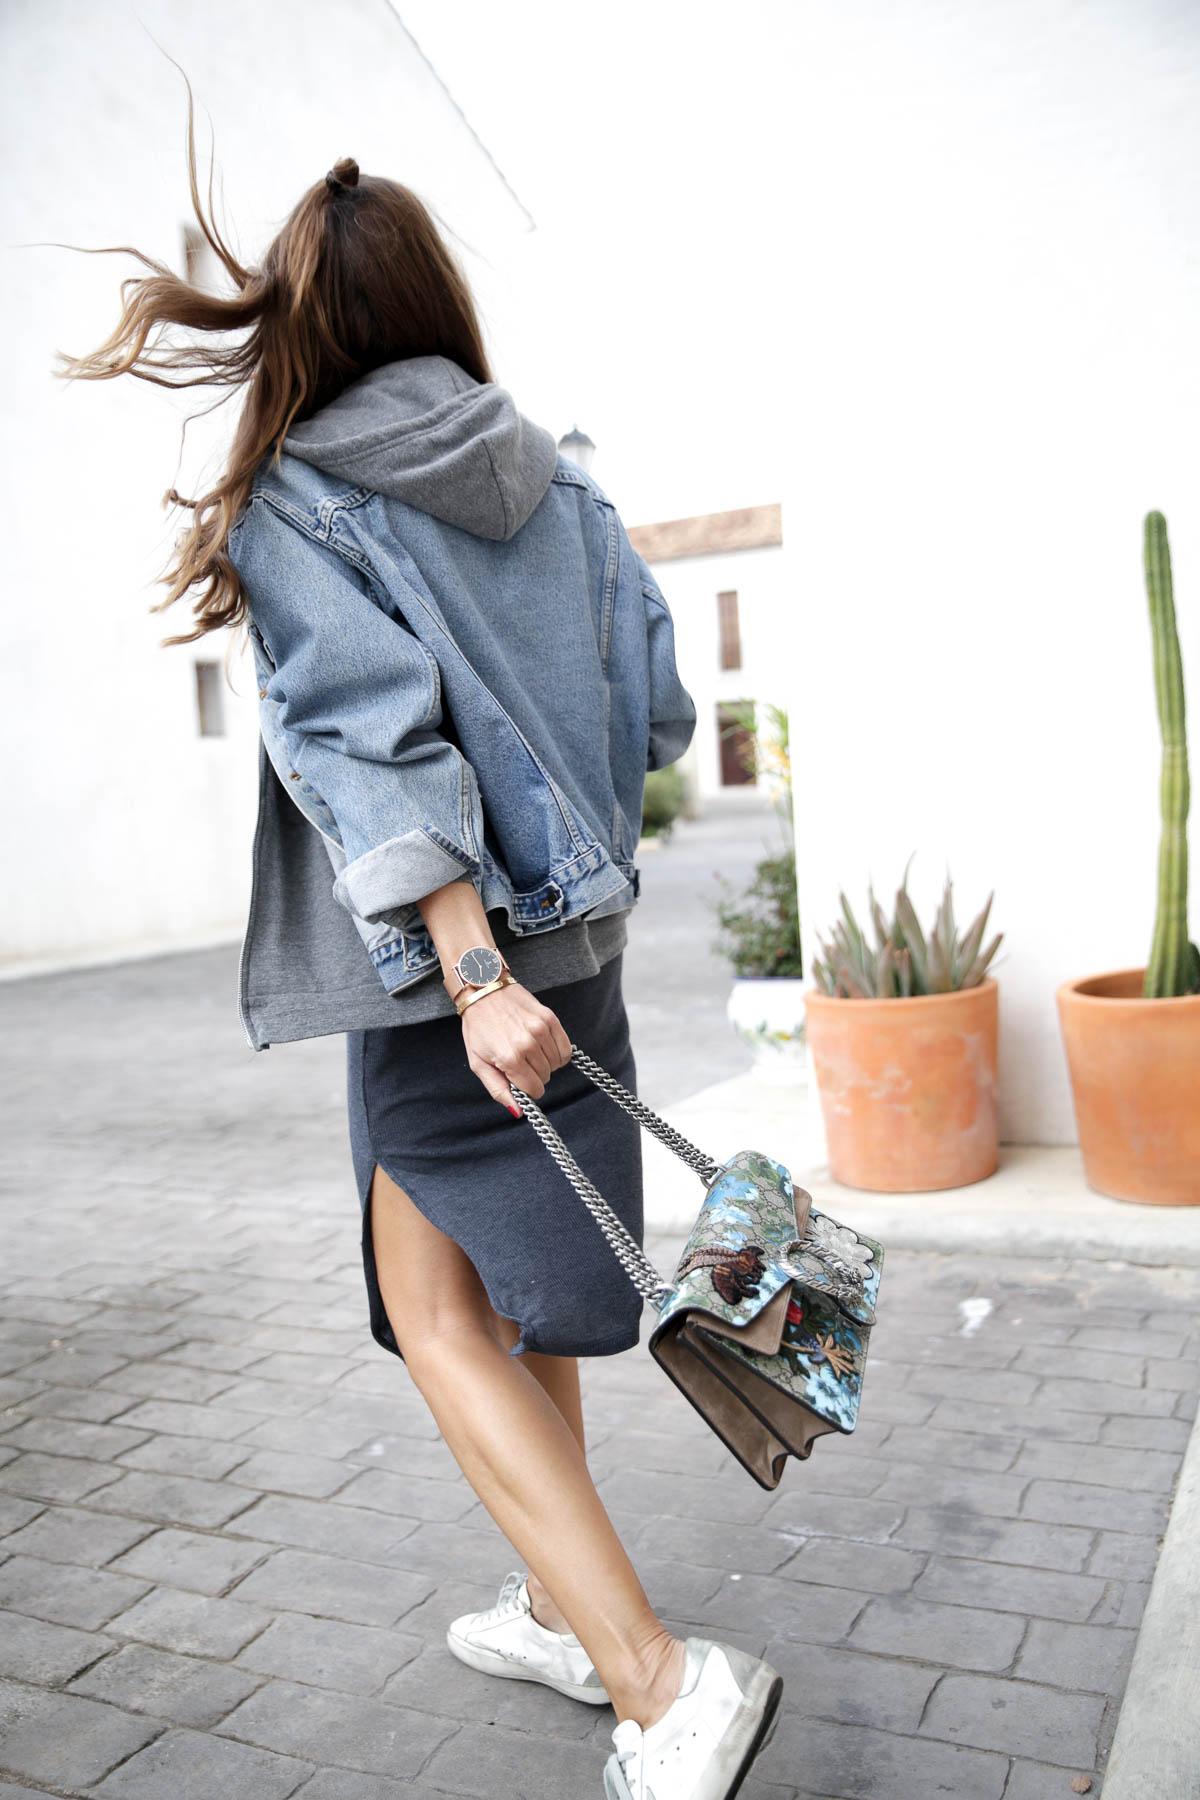 black-friday-a-bicyclette-sweatshirt-hoodie-all-star-leather-piel-cuero-celine-bag-bolso-mini-skirt-falda-streetstyle-look-bartabac-outfit-moda-blogger-7